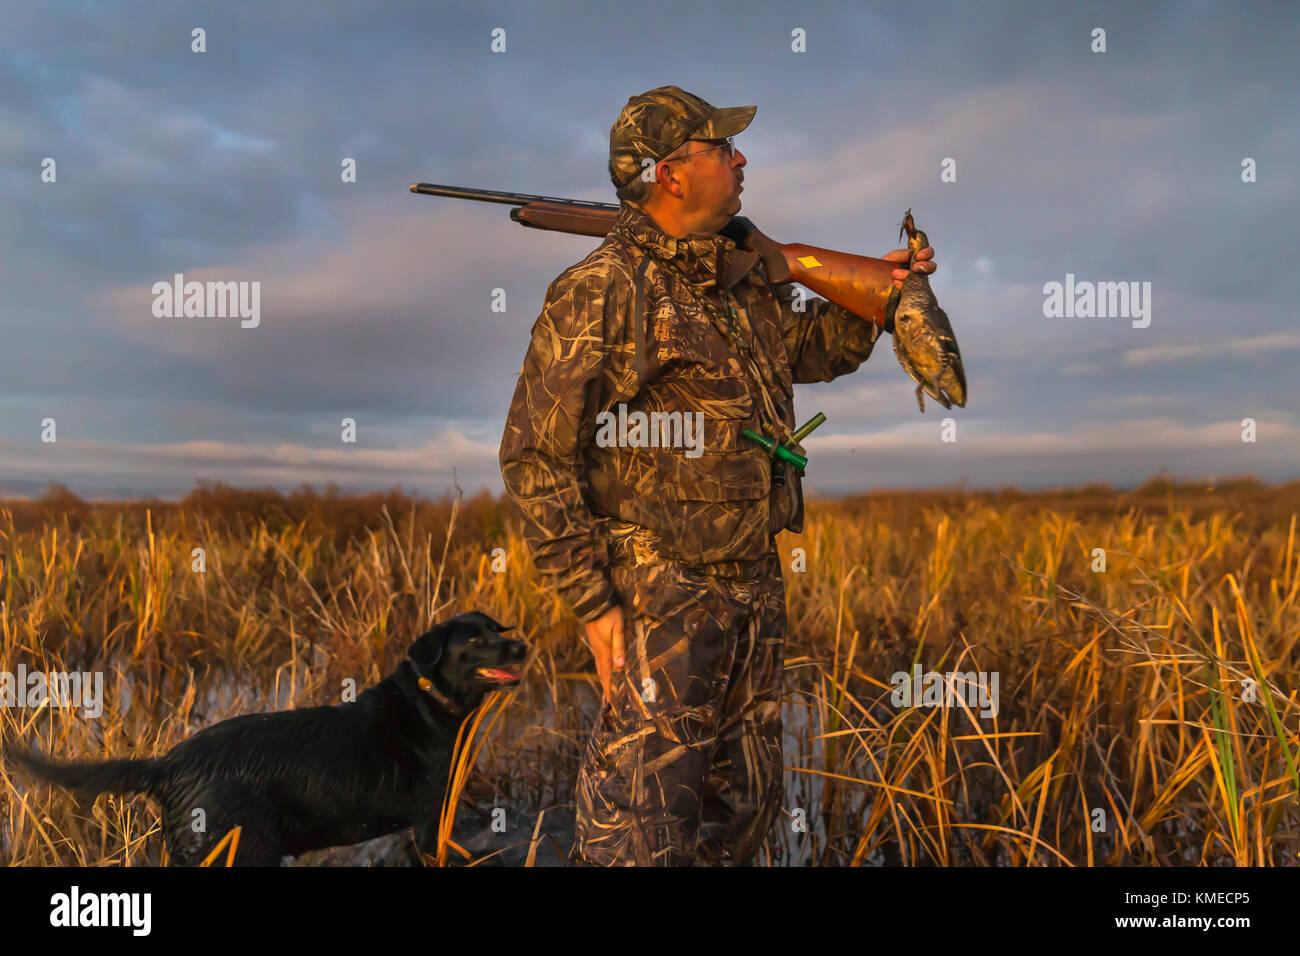 hunter holding duck and dog, Suisun Marsh, Suisun City, California, USA - Stock Image